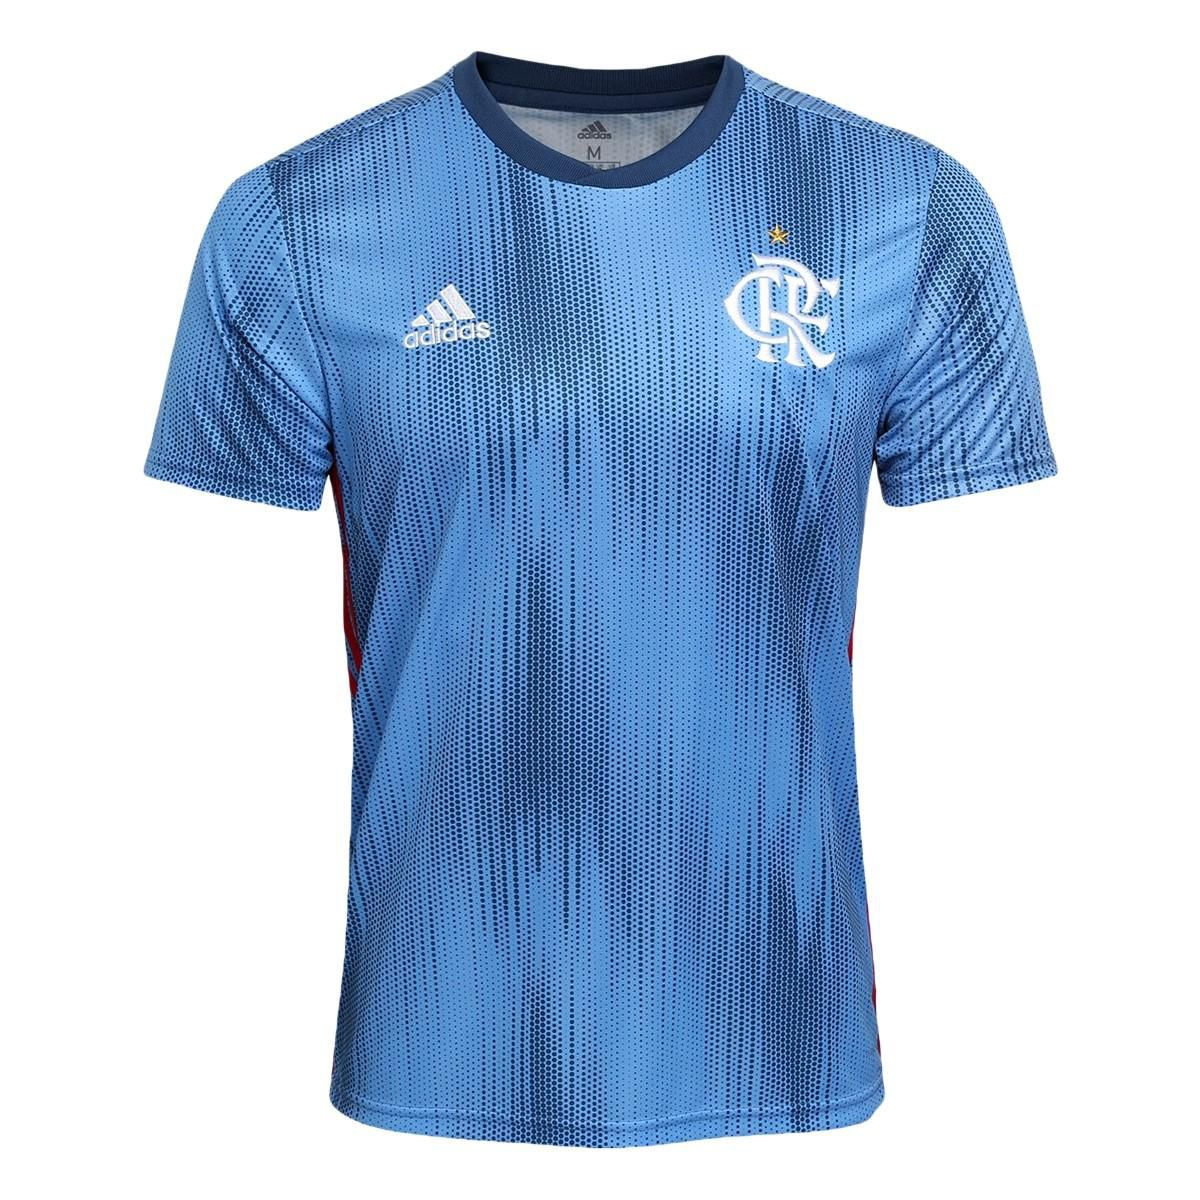 ca49e9fb5bf32 Camisa Masculina Adidas Flamengo Crf 3 Jsy - BRACIA SHOP  Loja de ...